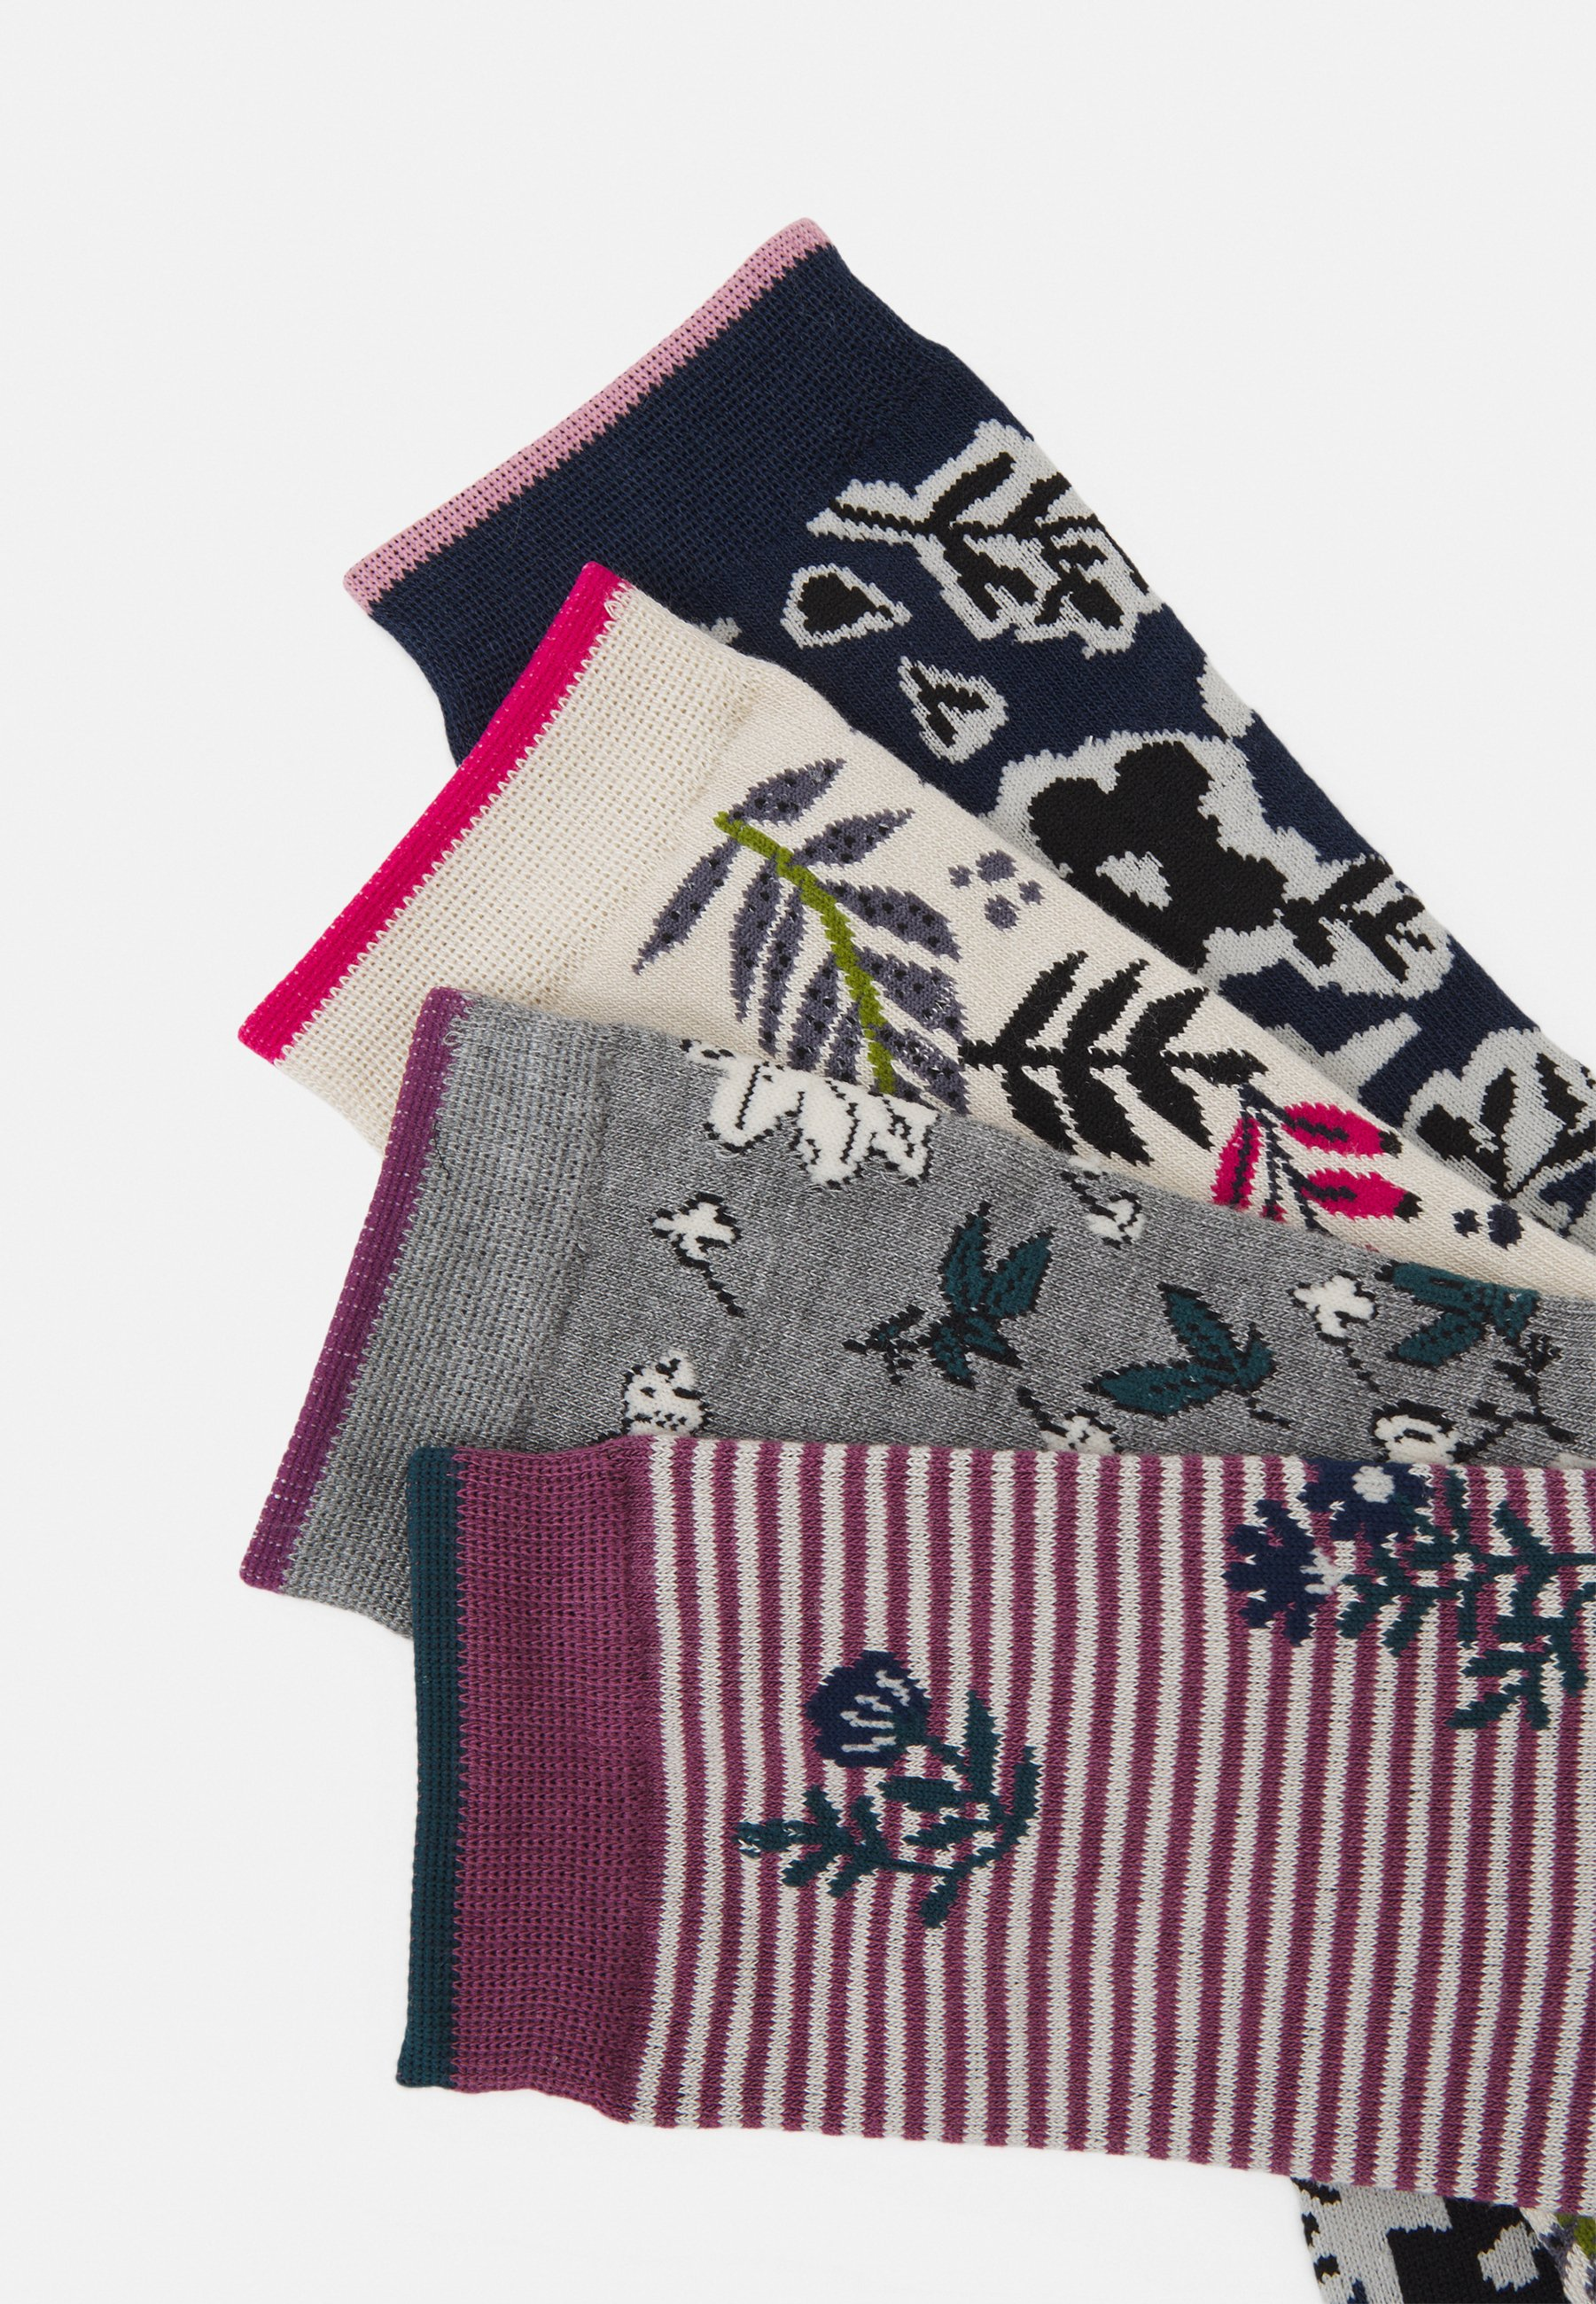 Femme RASMINE FLORAL SOCK BOX 4 PACK - Chaussettes